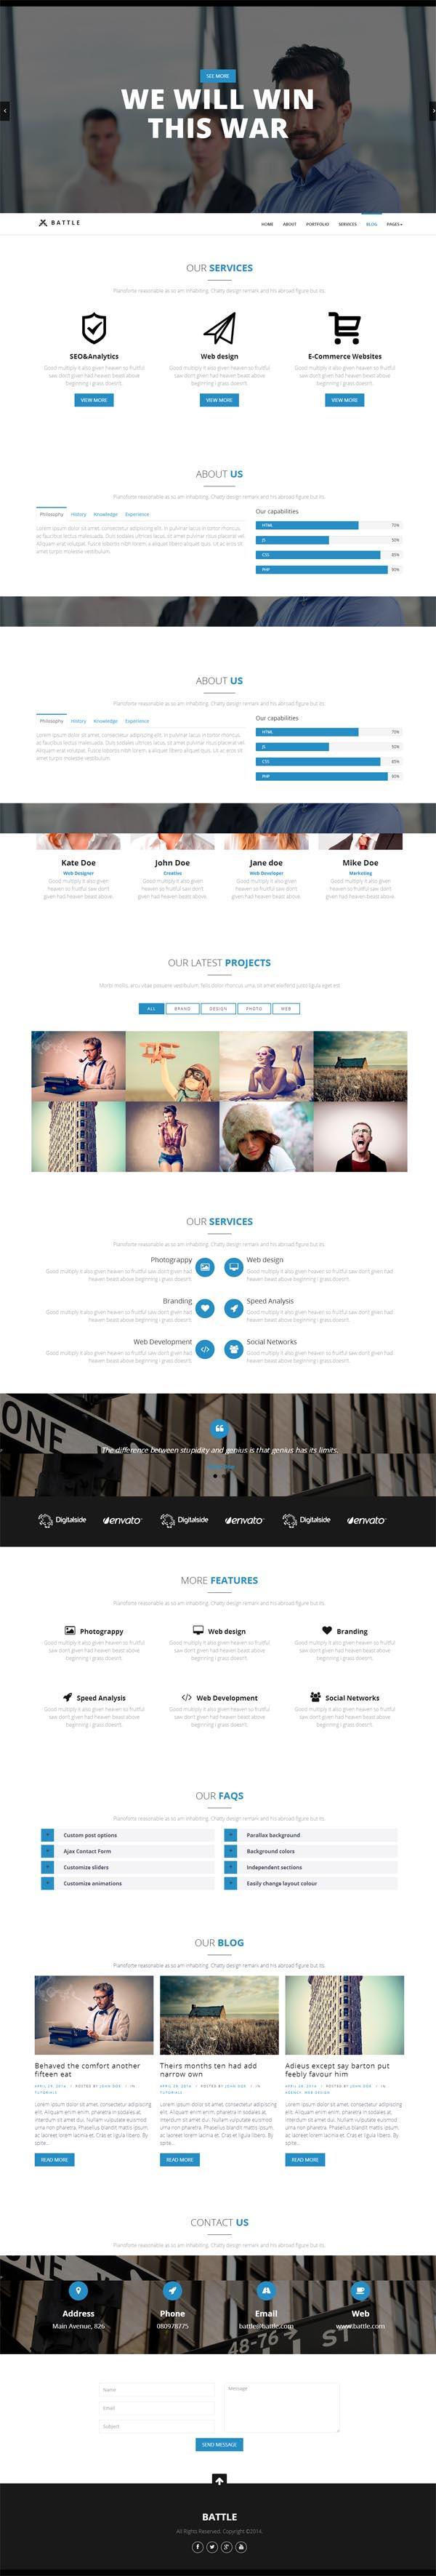 Battle - Responsive Multi-Purpose WordPress Theme